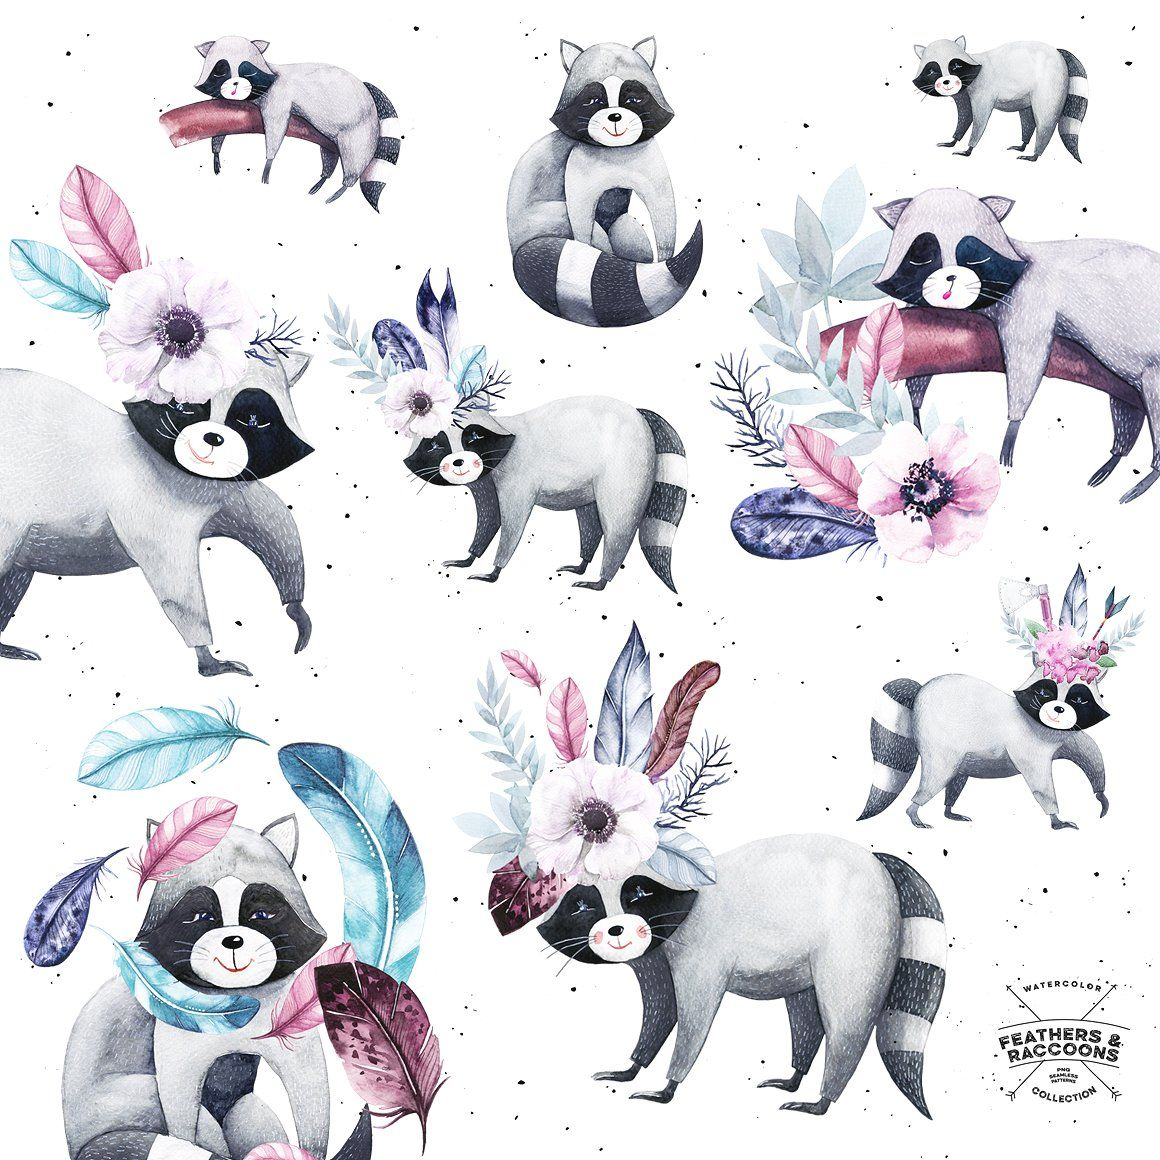 Watercolor Feathers & Raccoons by Spasibenko Art on @creativemarket